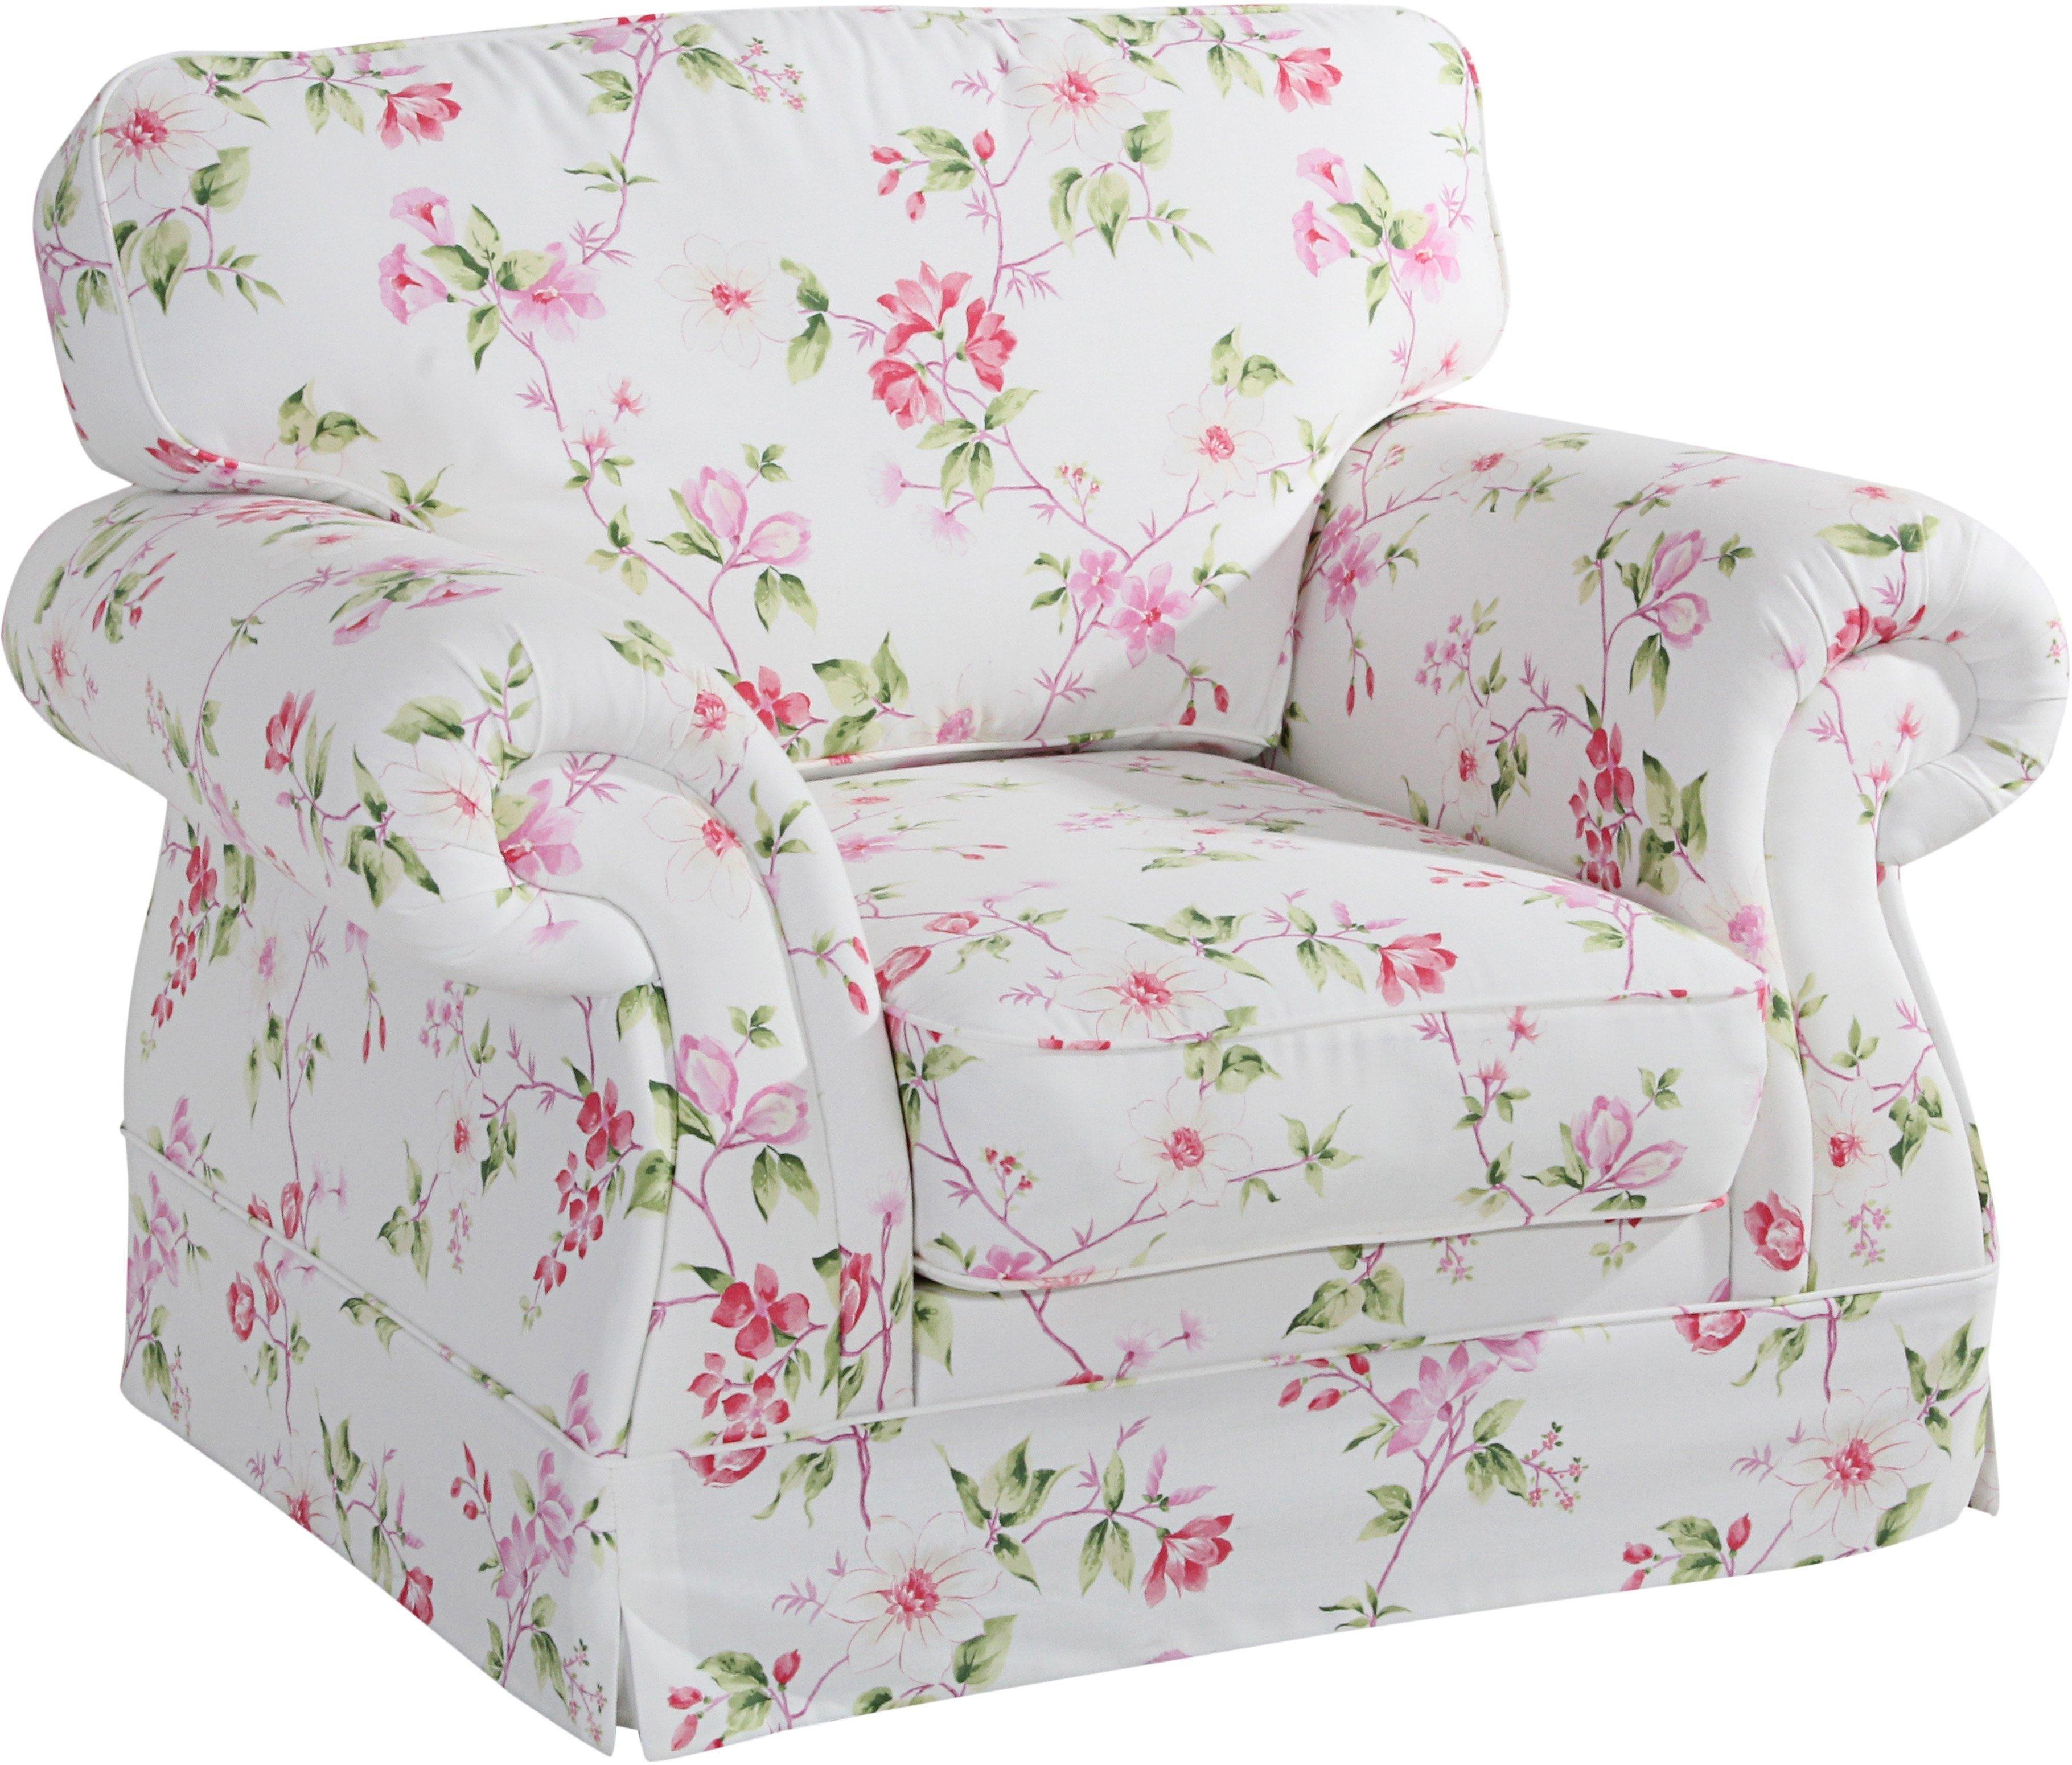 Kaufen Ledersessel Mobel Klassiker Sessel Braun Ledersessel Couch Mit Sessel Hukla Fernsehsessel Elektrisch Mit Aufstehhilfe